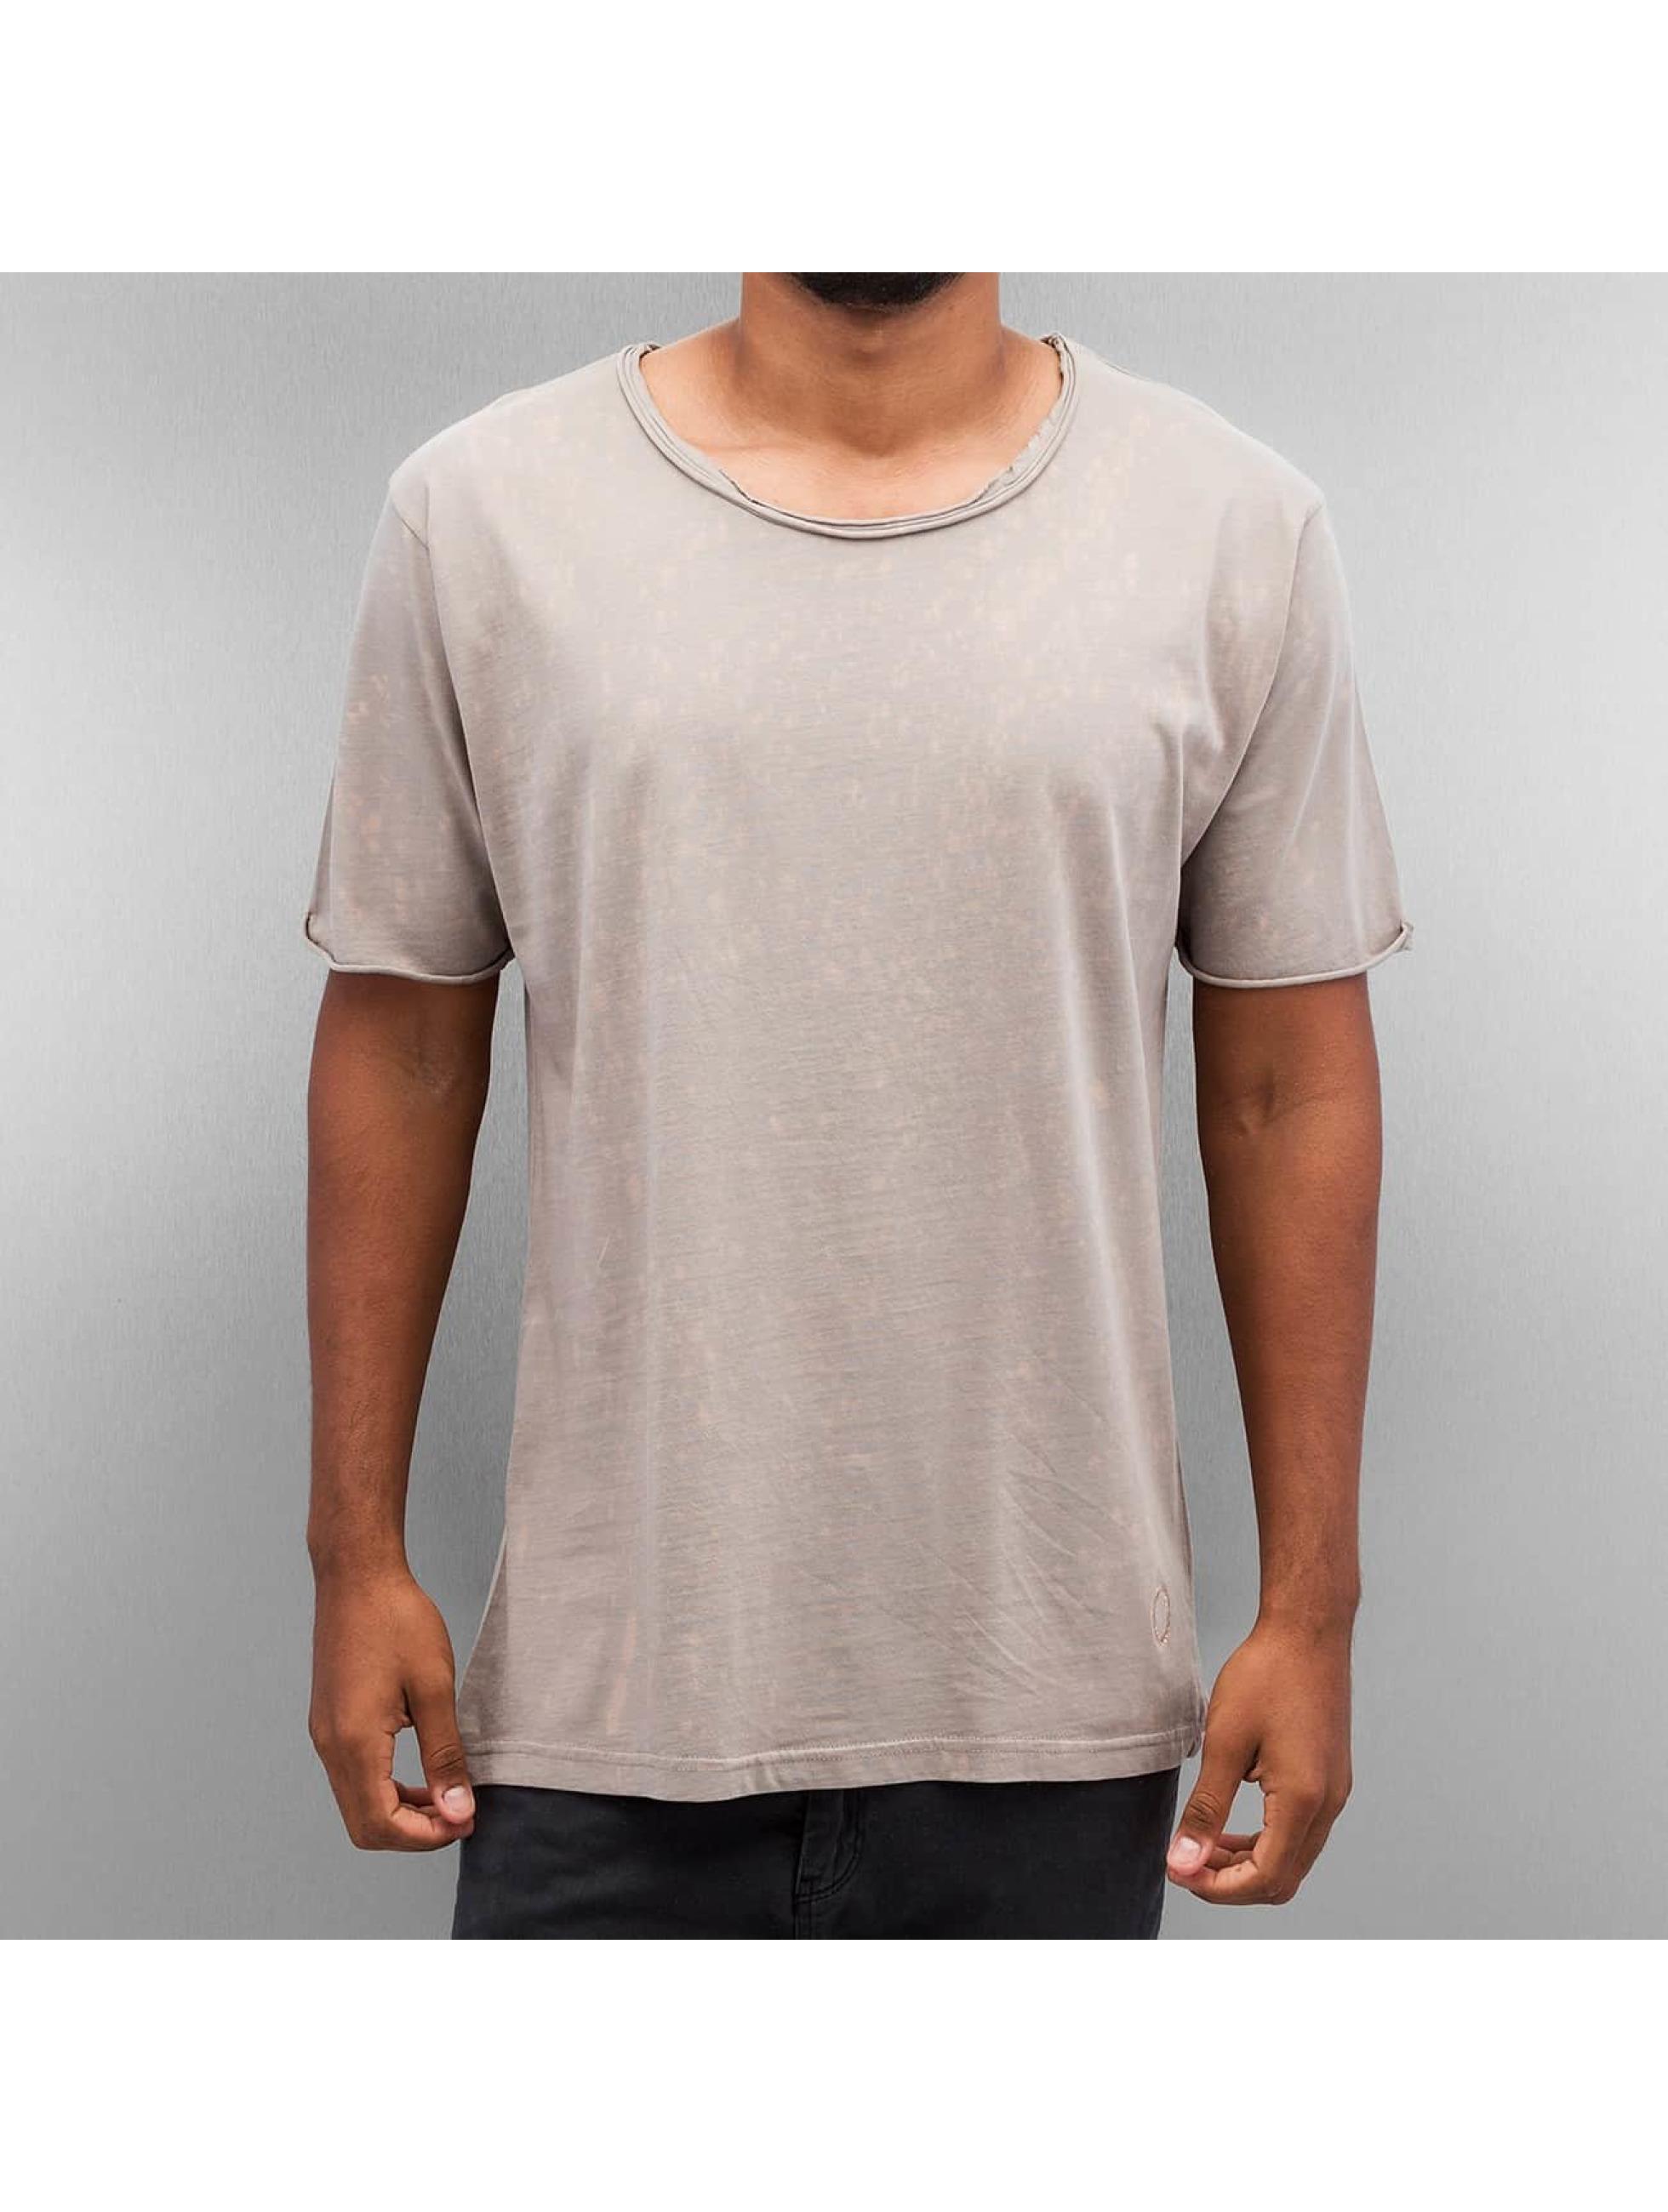 Yezz Männer T-Shirt Splash in grau